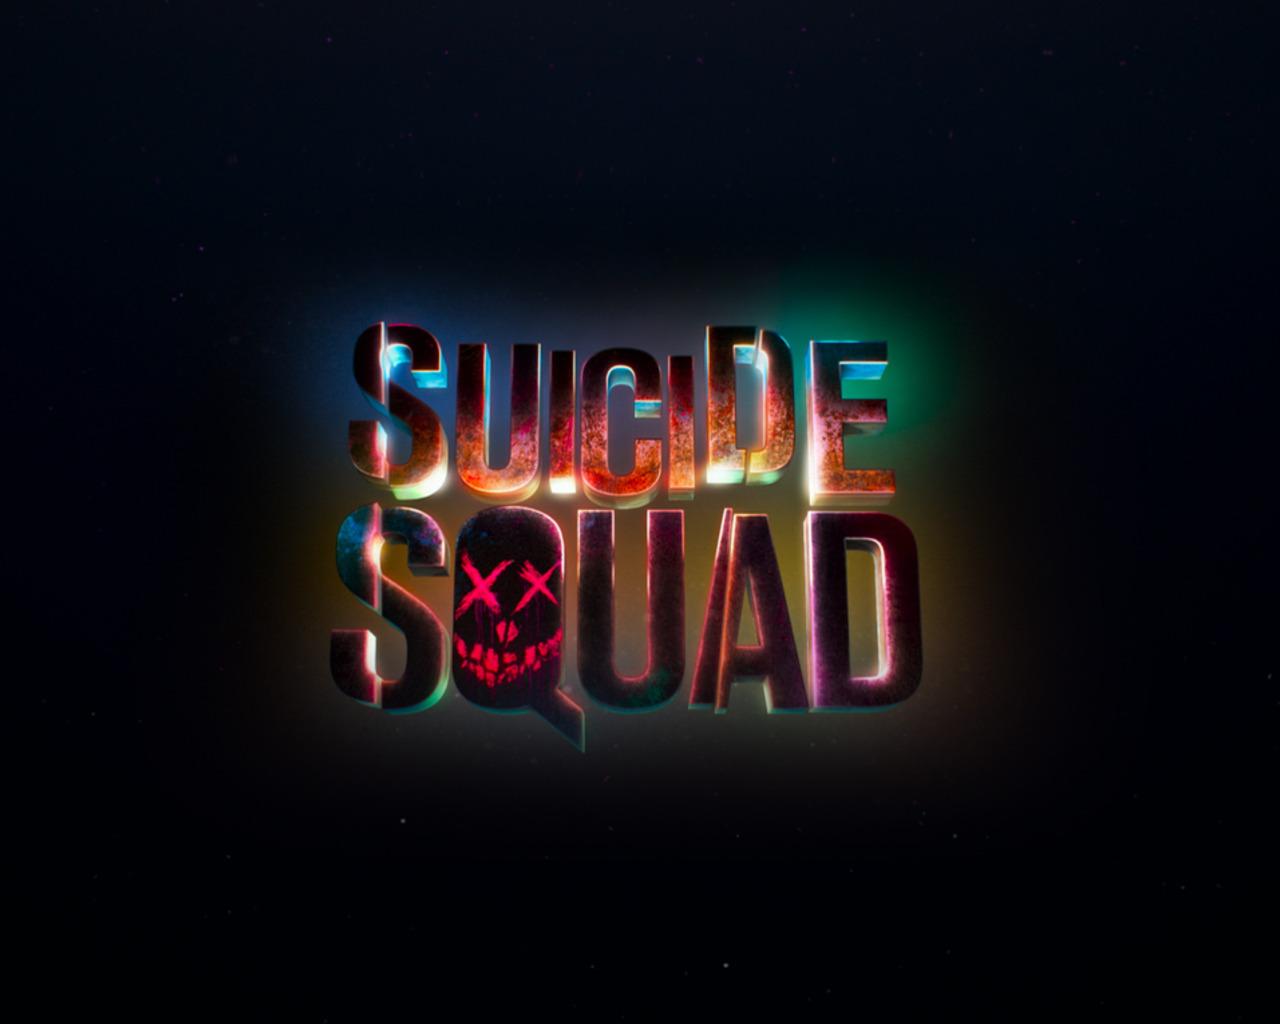 1280x1024 Suicide Squad Logo 1280x1024 Resolution HD 4k